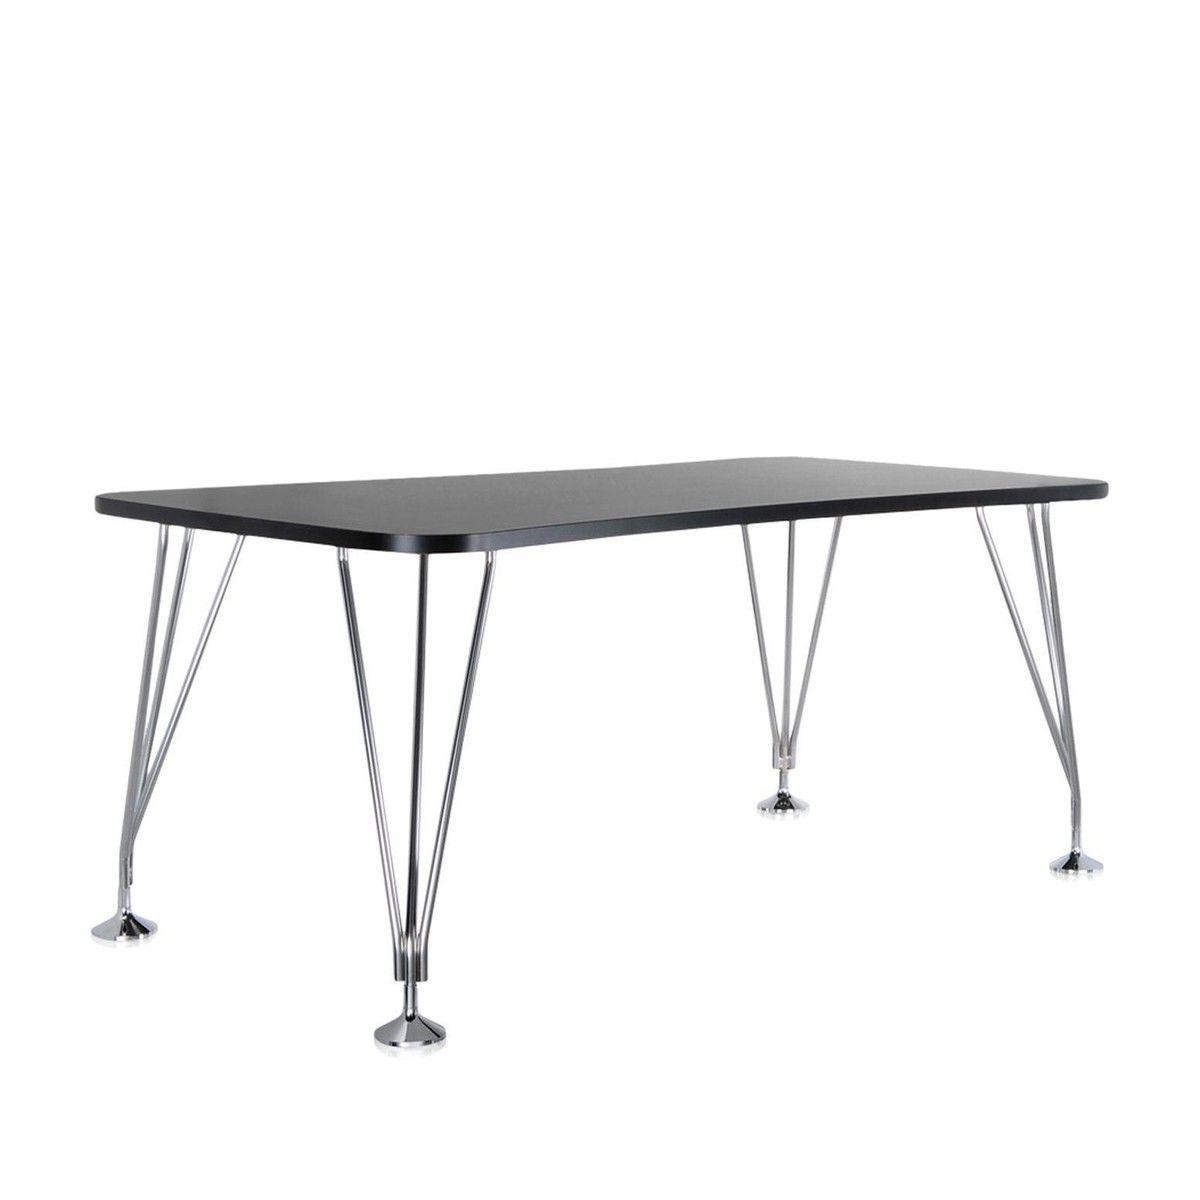 max table xcm  kartell  ambientedirectcom - kartell  max tisch xcm  schiefergraugestell verchromter stahlmitfesten standfüßen